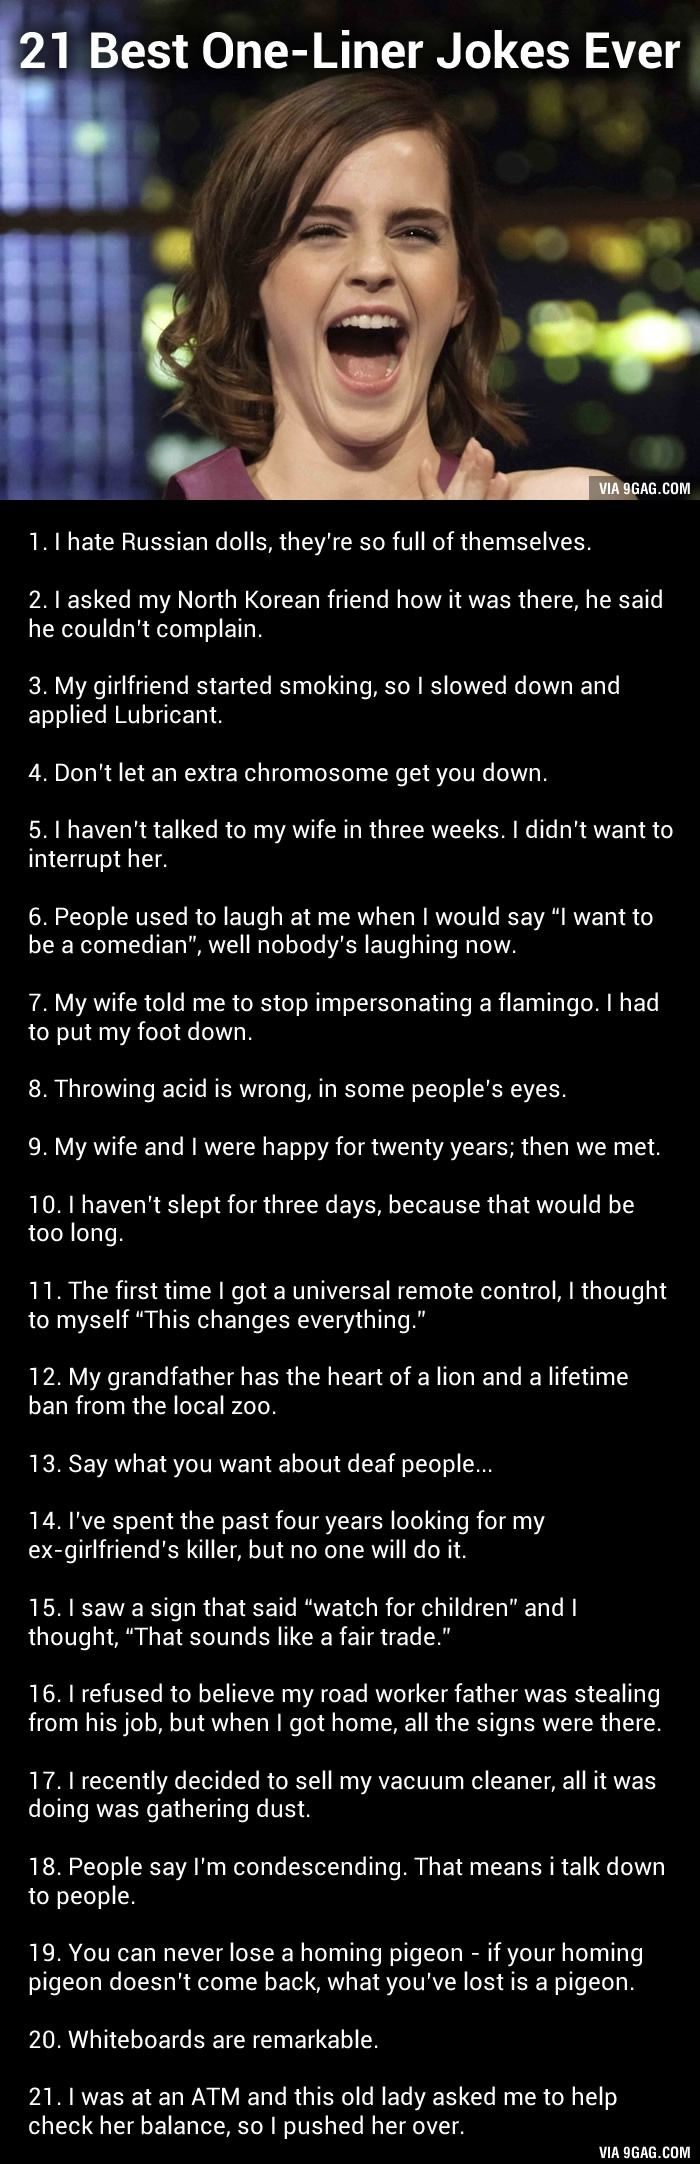 Best OneLiner Jokes Ever St Humor And Random - 21 best one line jokes ever